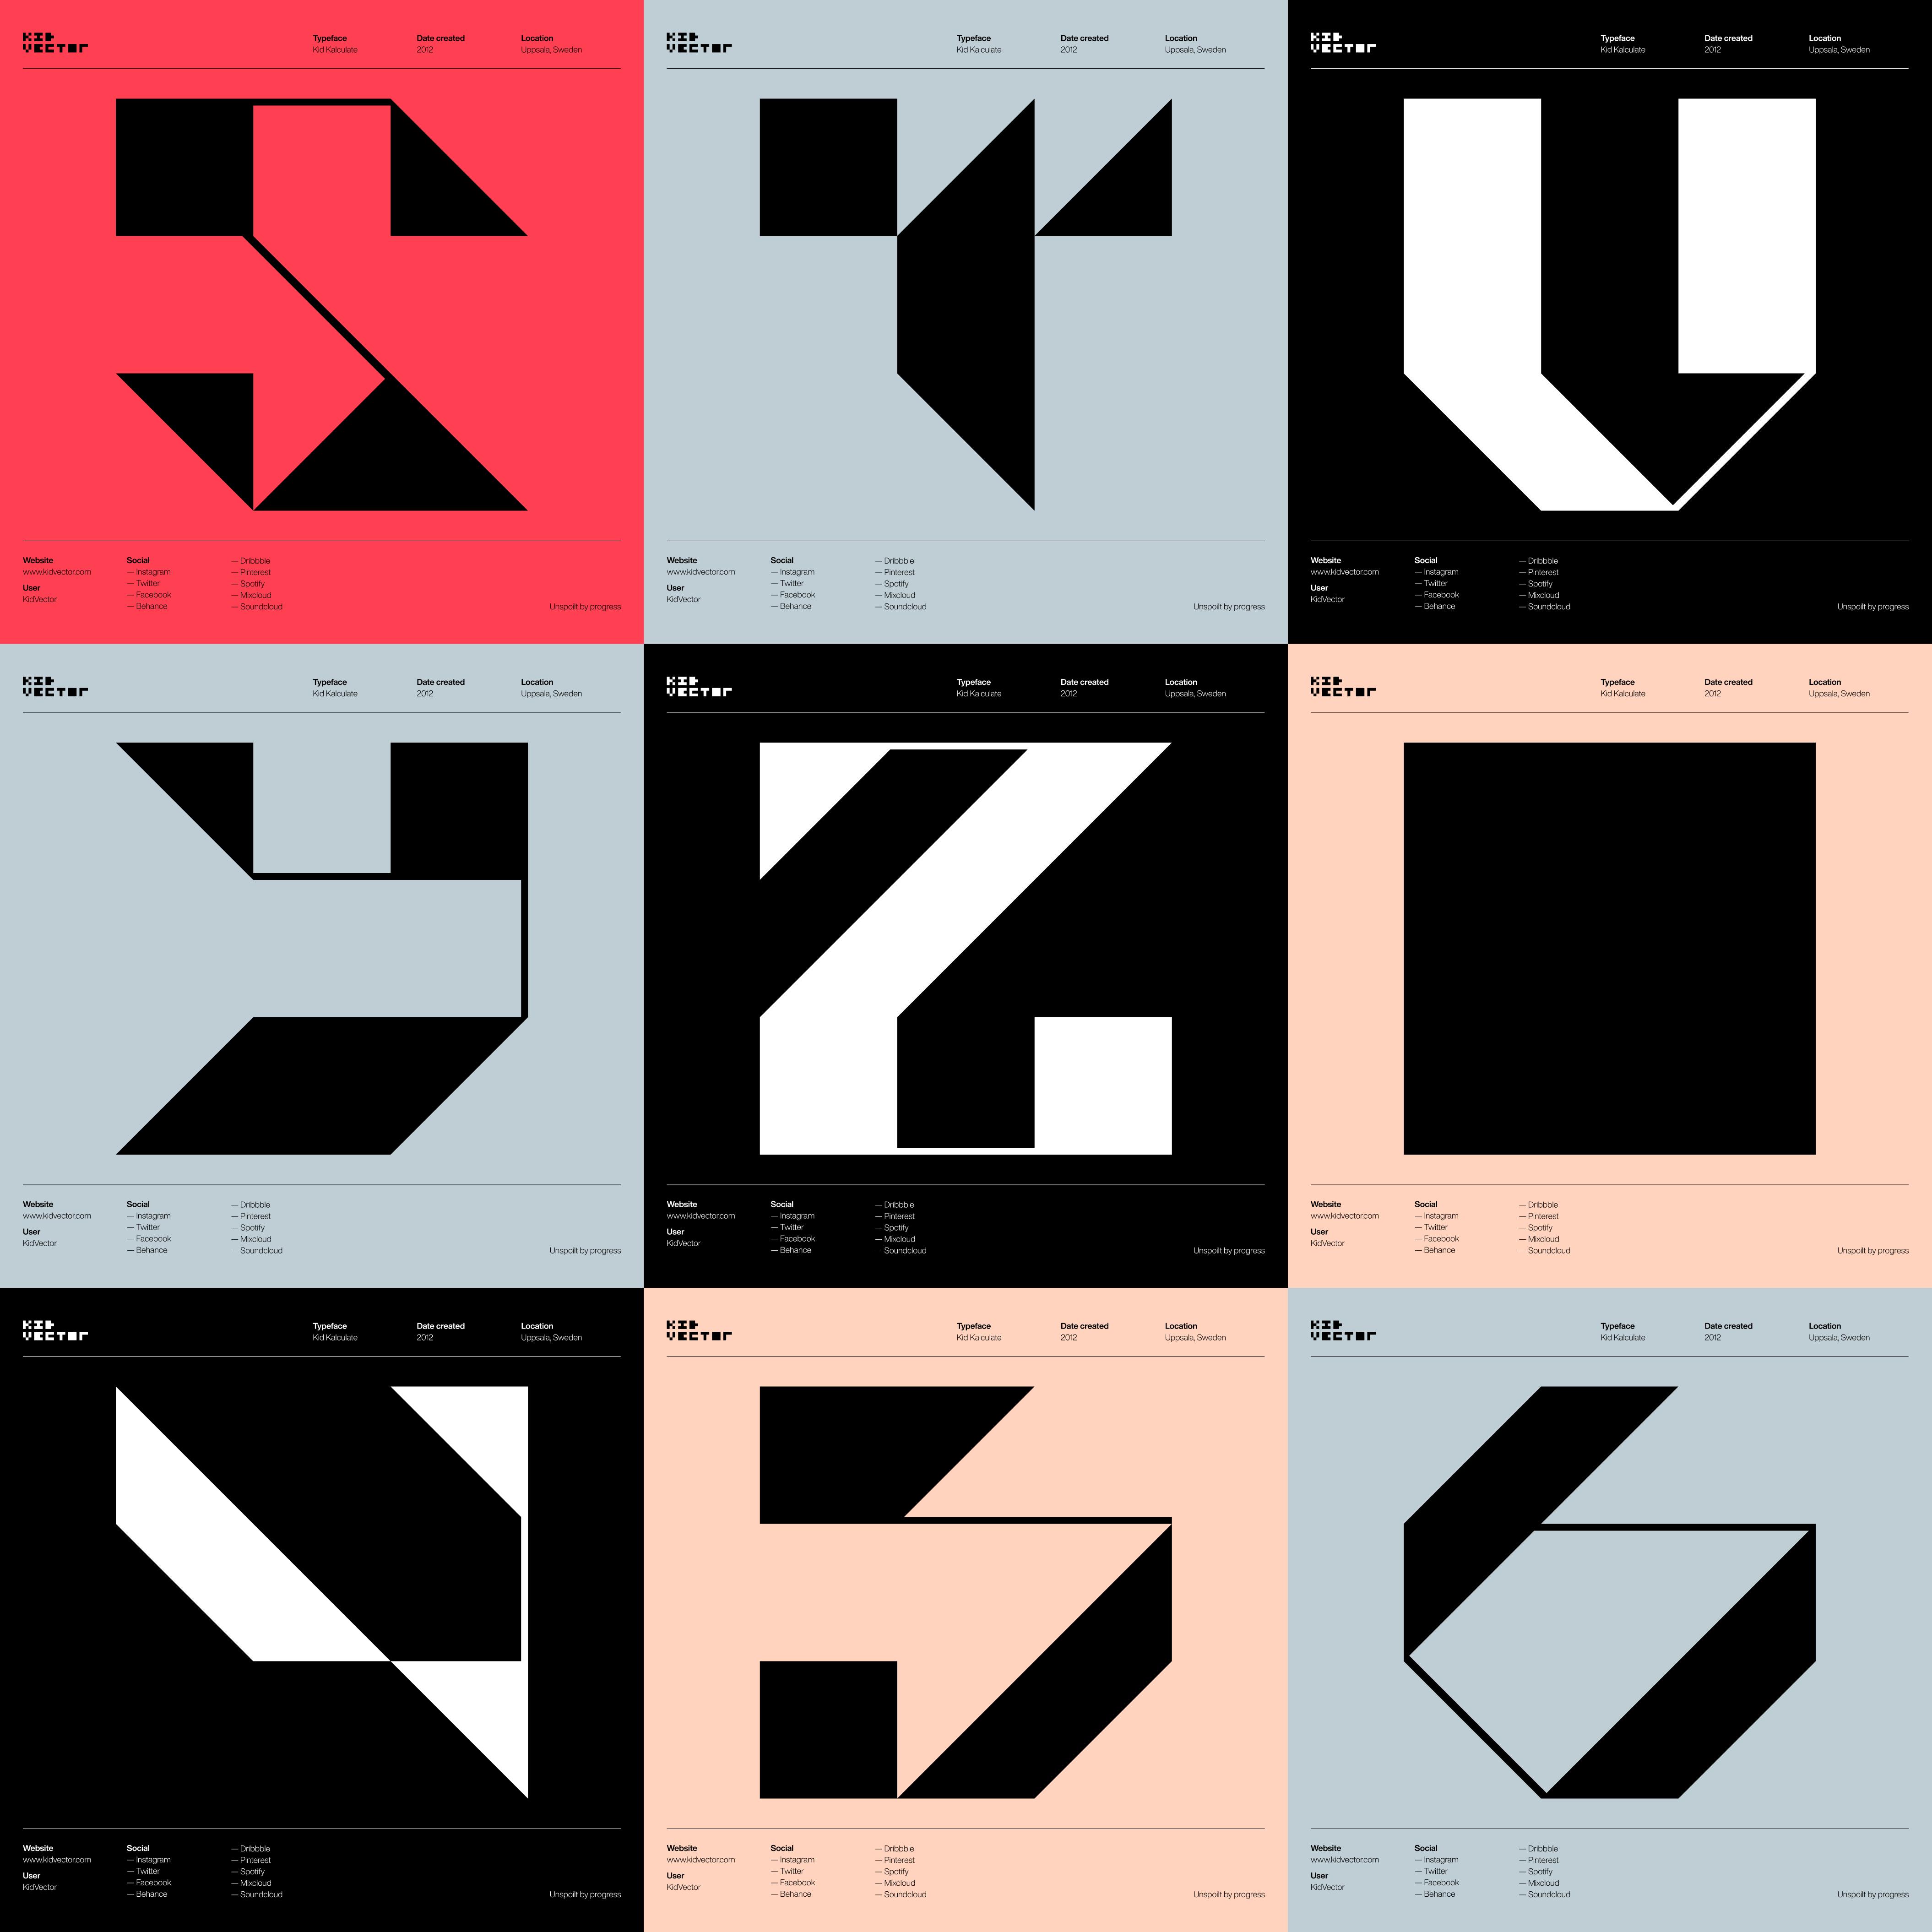 Kid Kalculate — 3 x 3 character grid 3